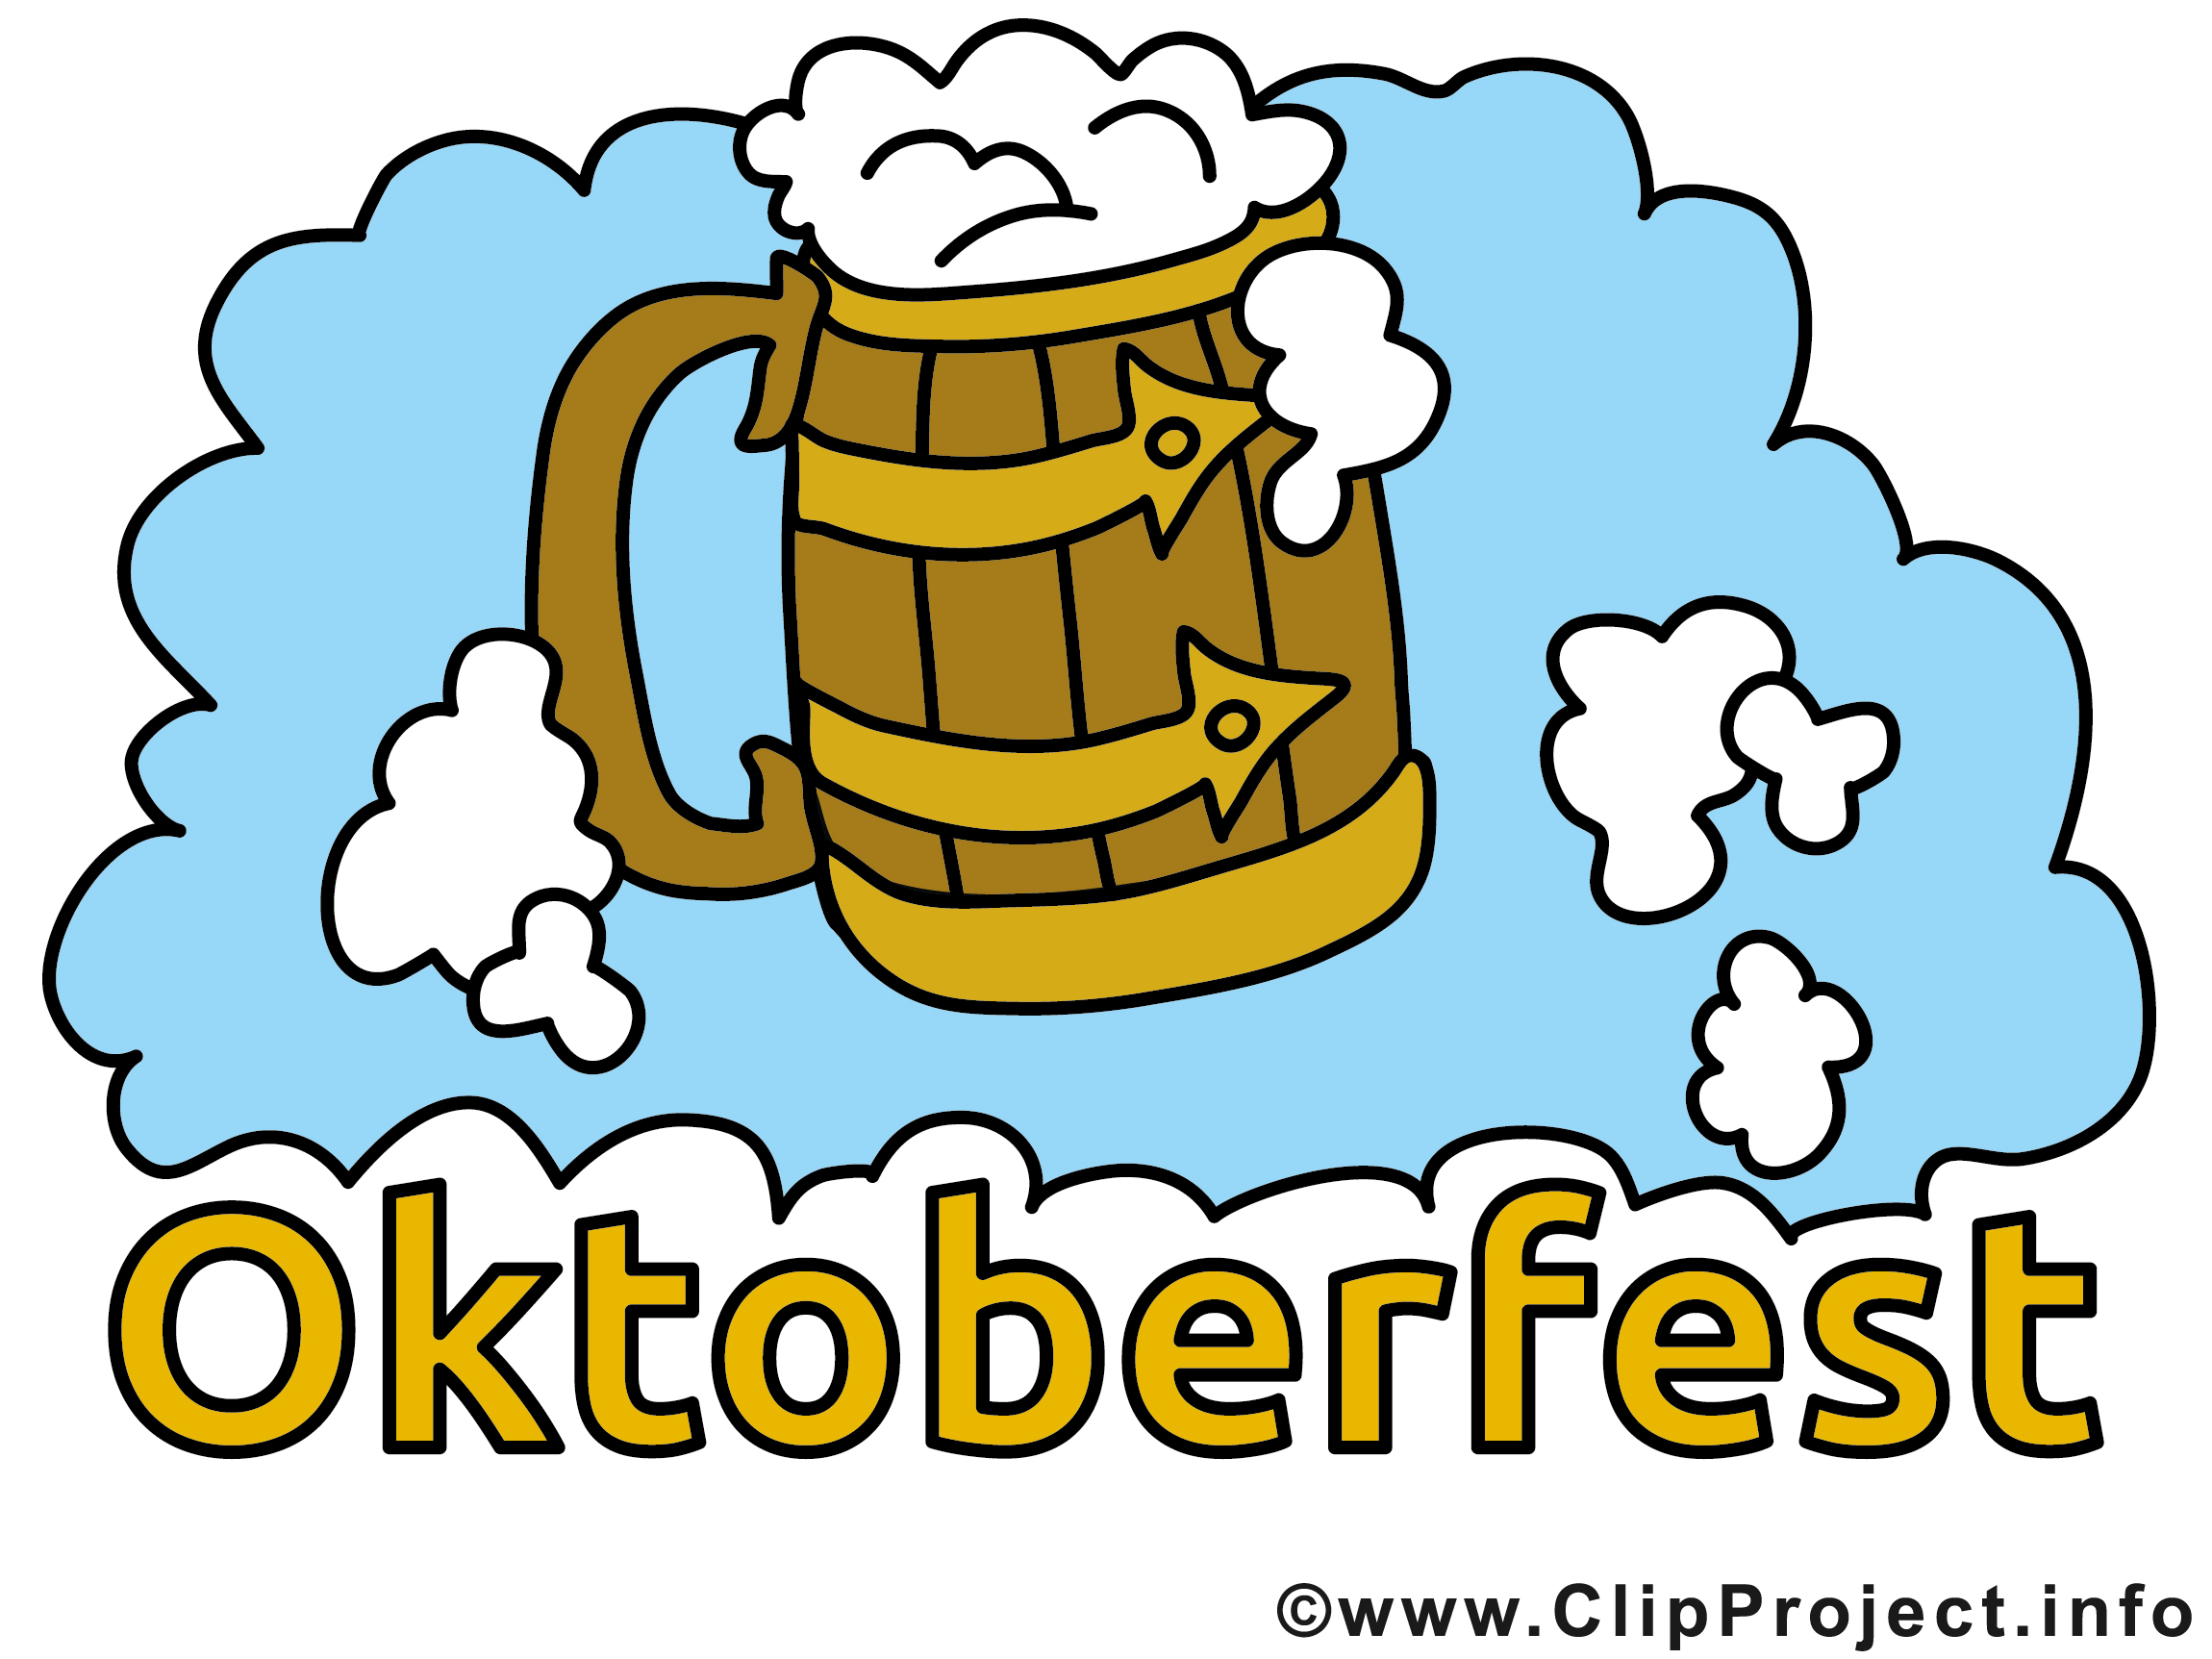 Oktoberfest Bilder, Cliparts, Cartoons, Grafiken, Illustrationen ... banner black and white